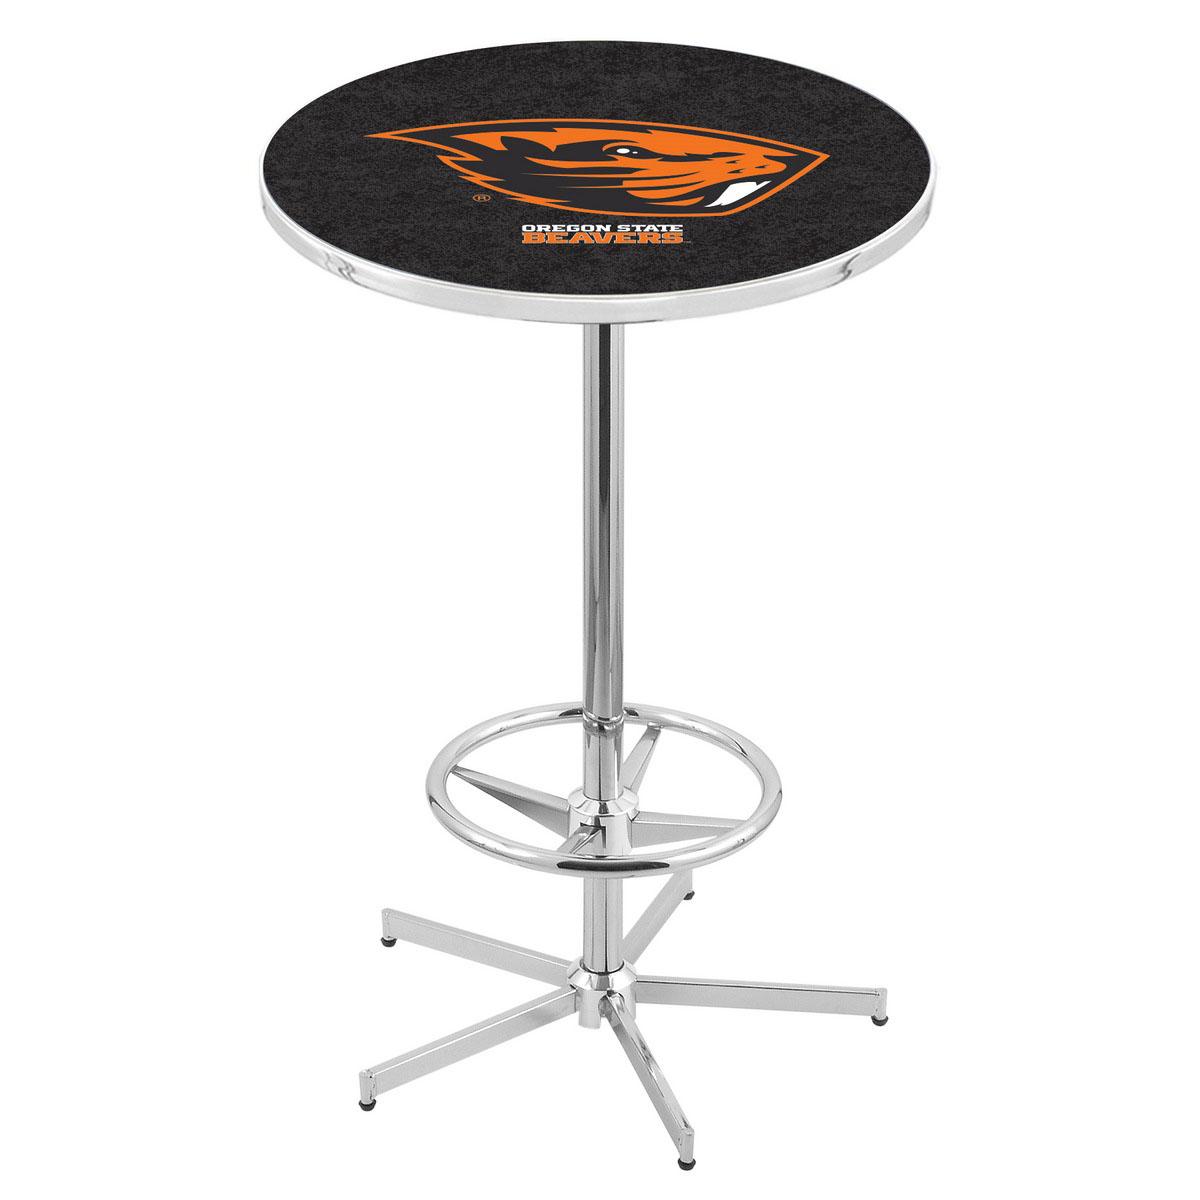 Design Chrome Oregon State Pub Table Product Photo